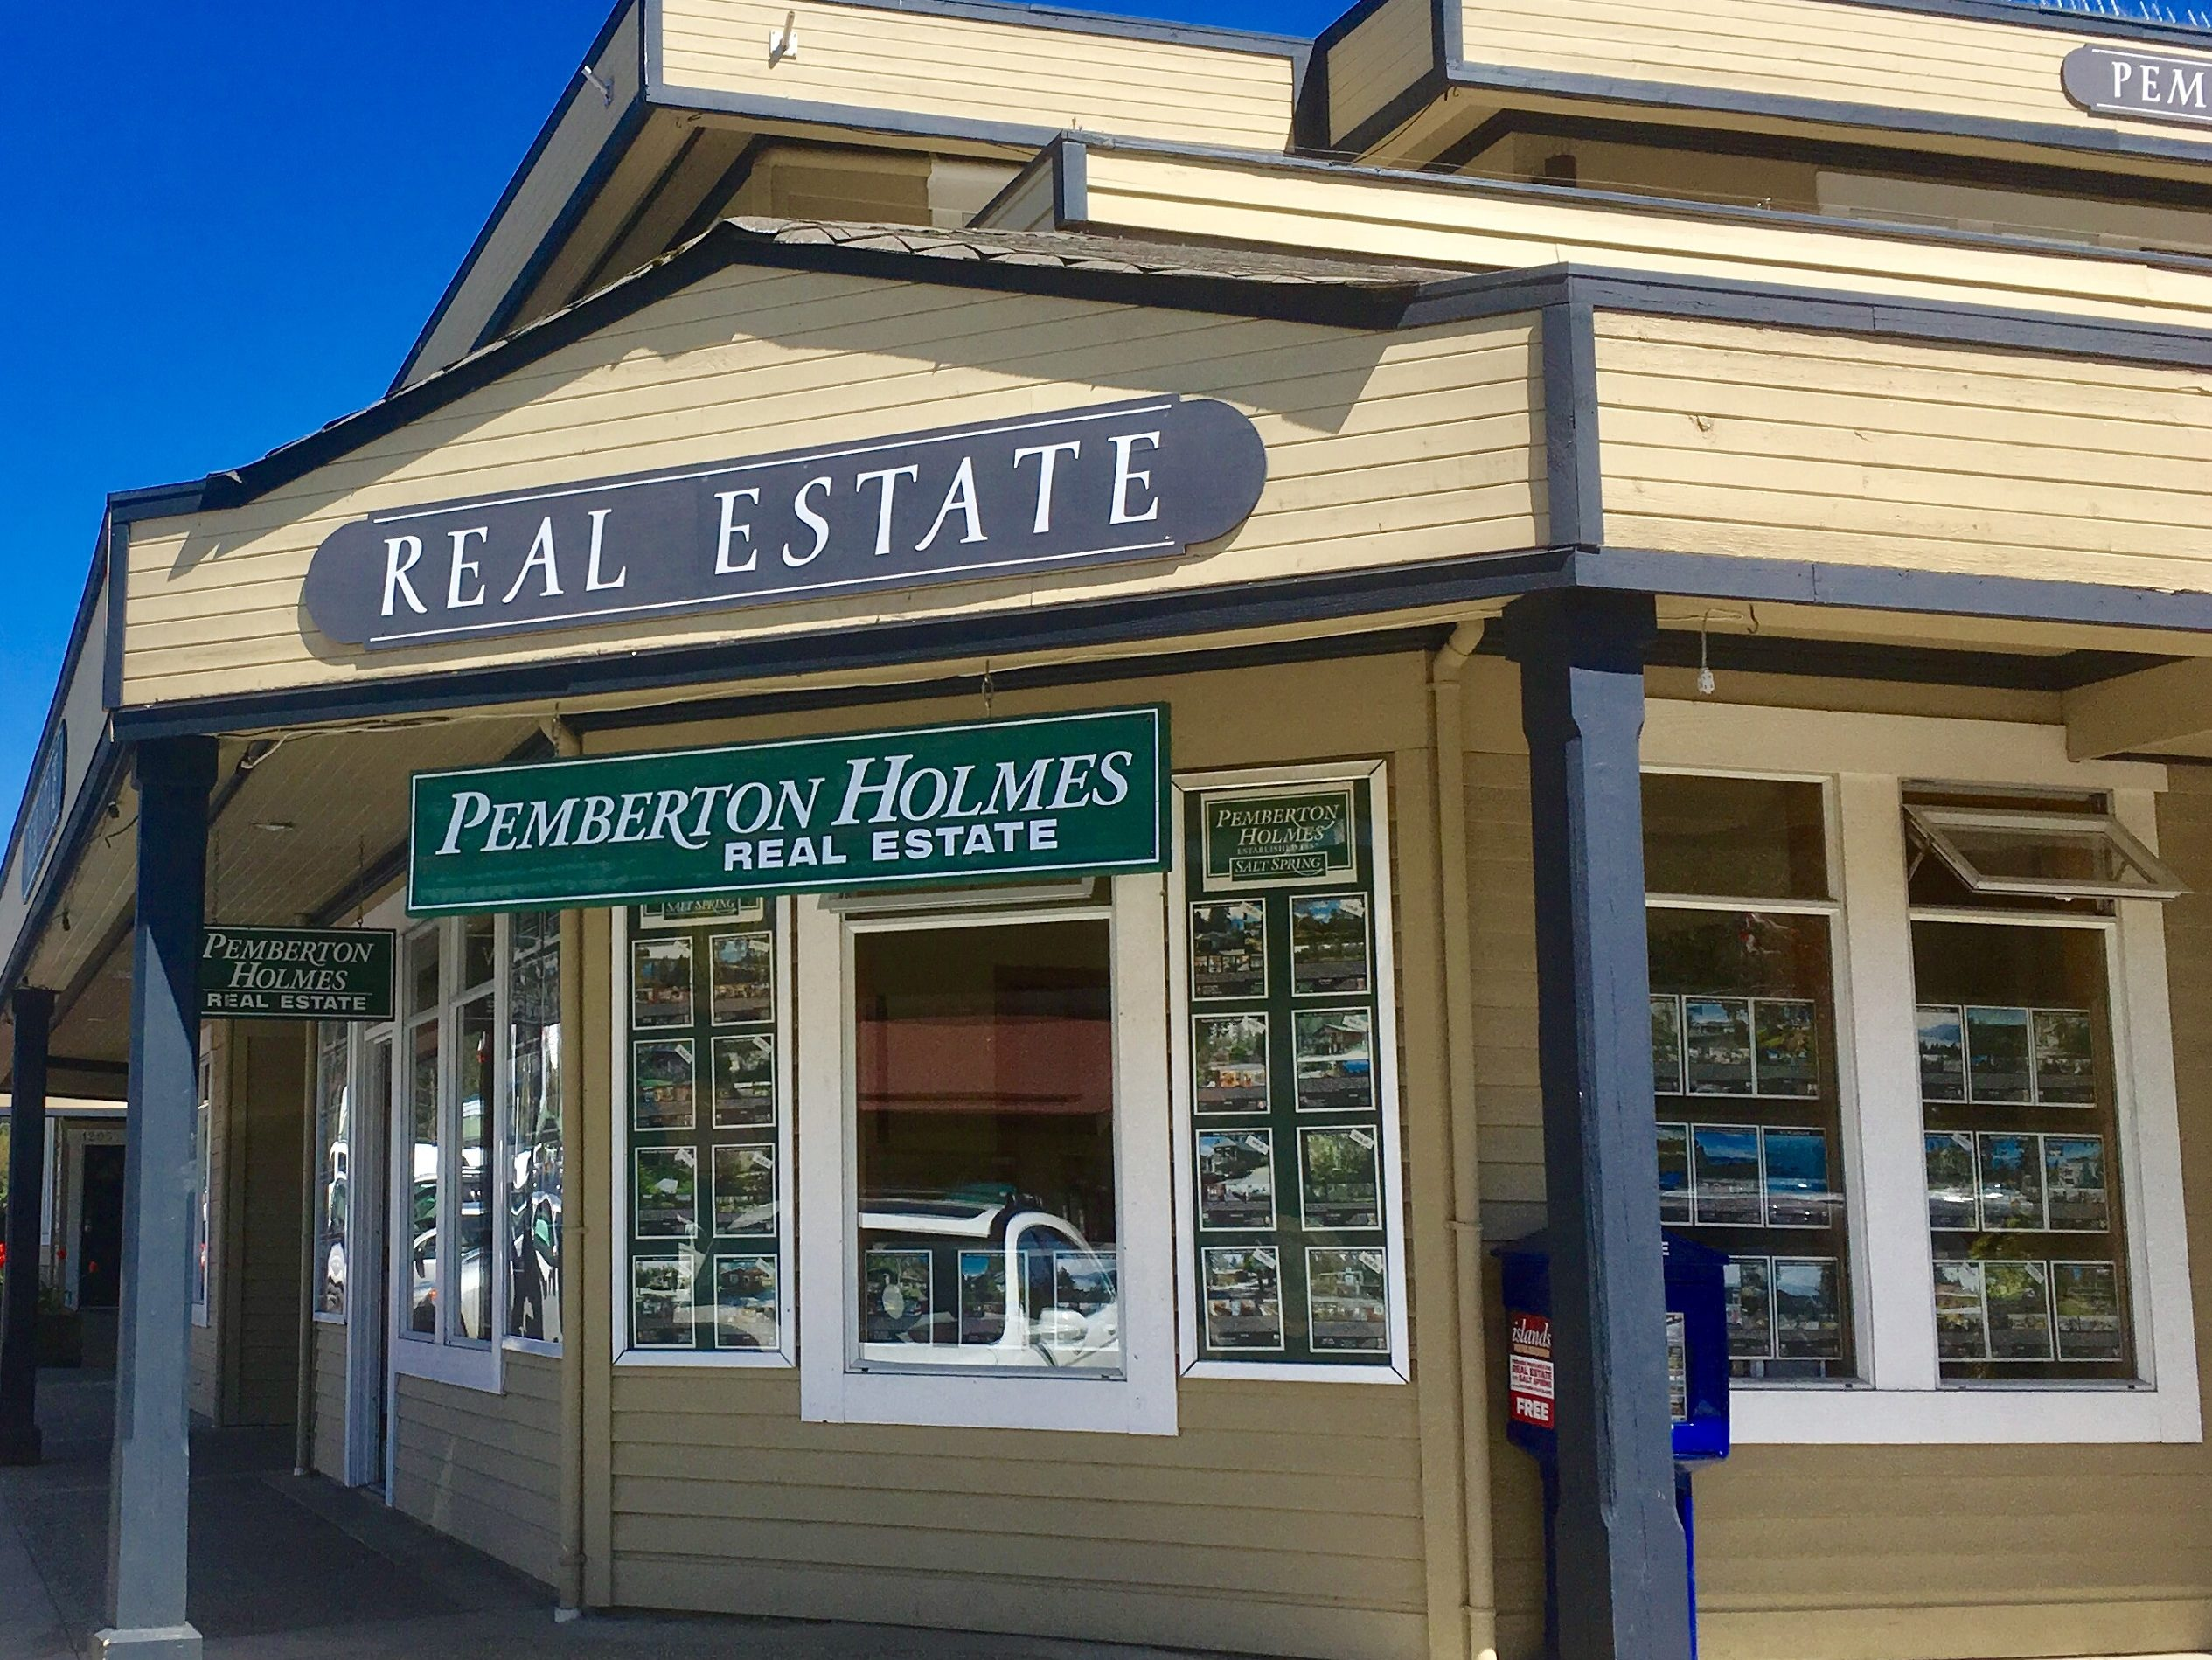 Pemberton Holmes Salt Spring Island BC office contact information